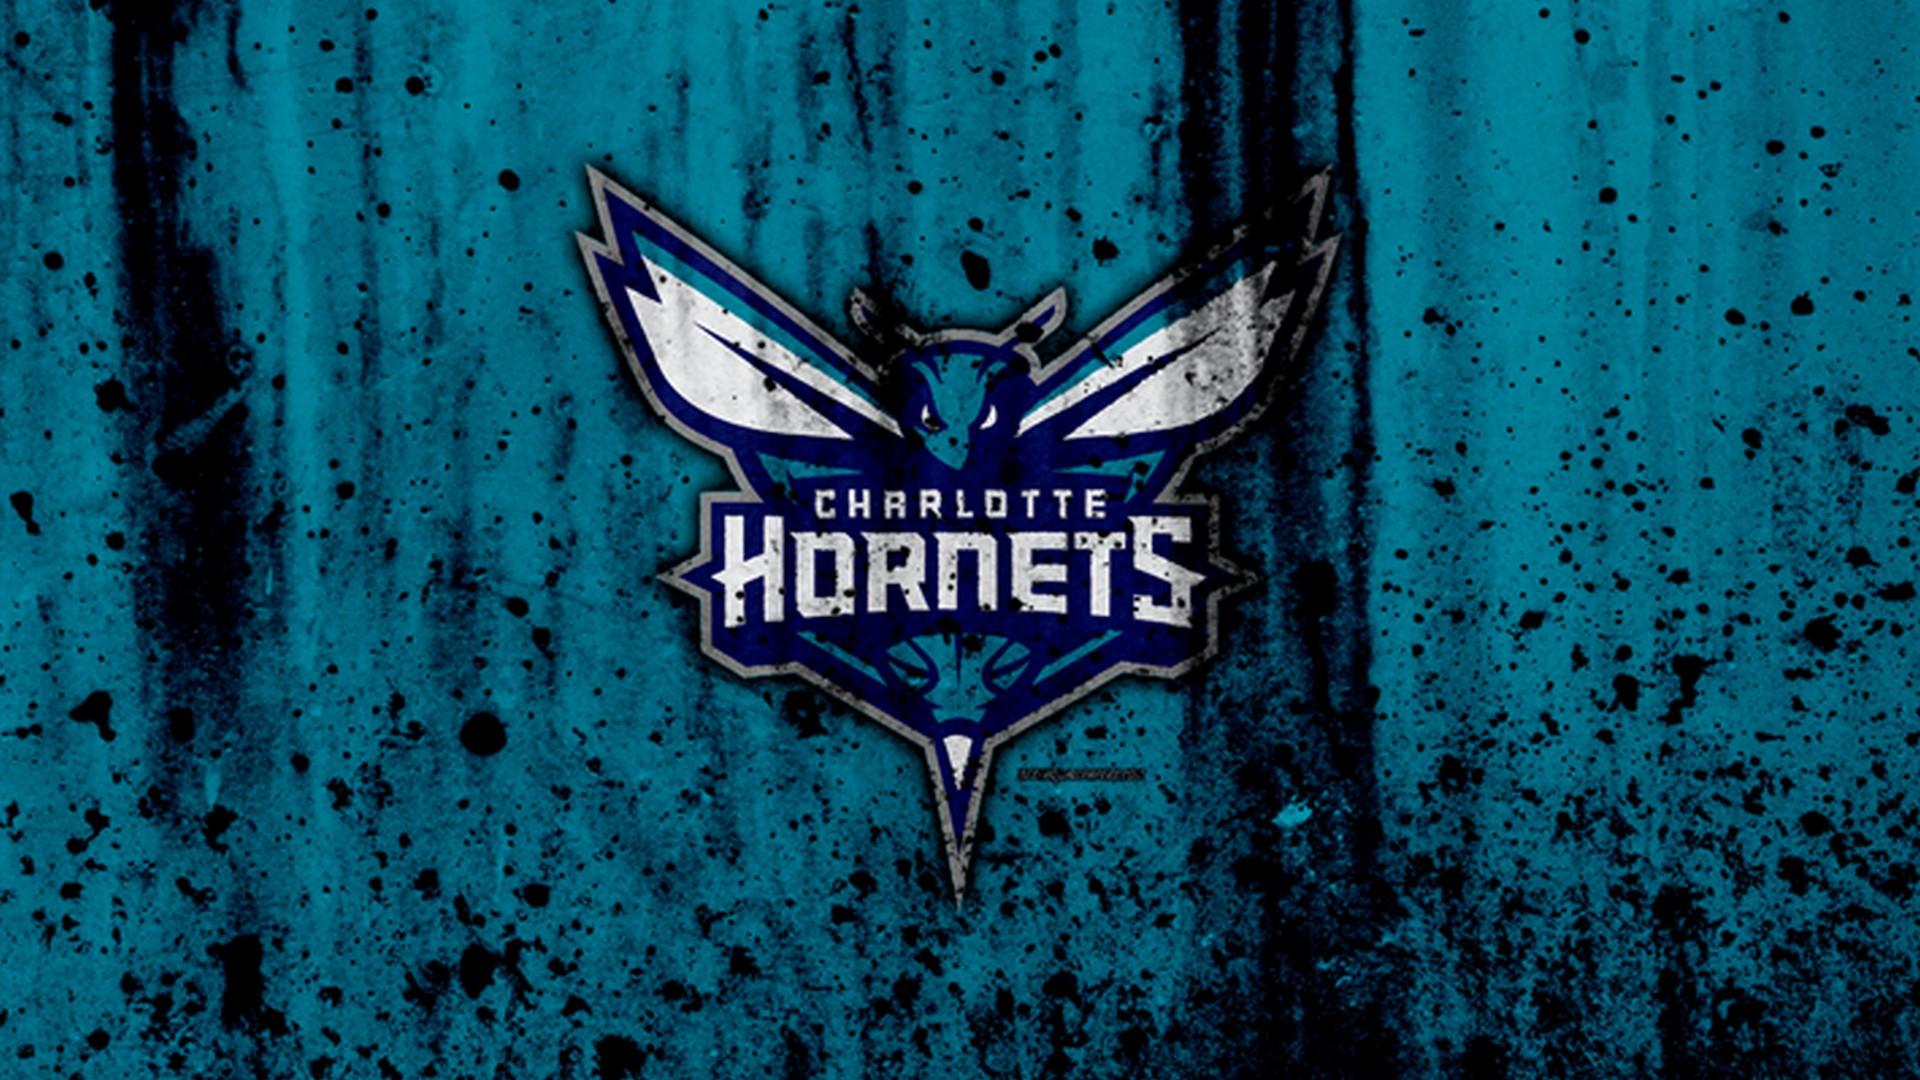 Charlotte Hornets Backgrounds HD 2019 Basketball Wallpaper 1920x1080